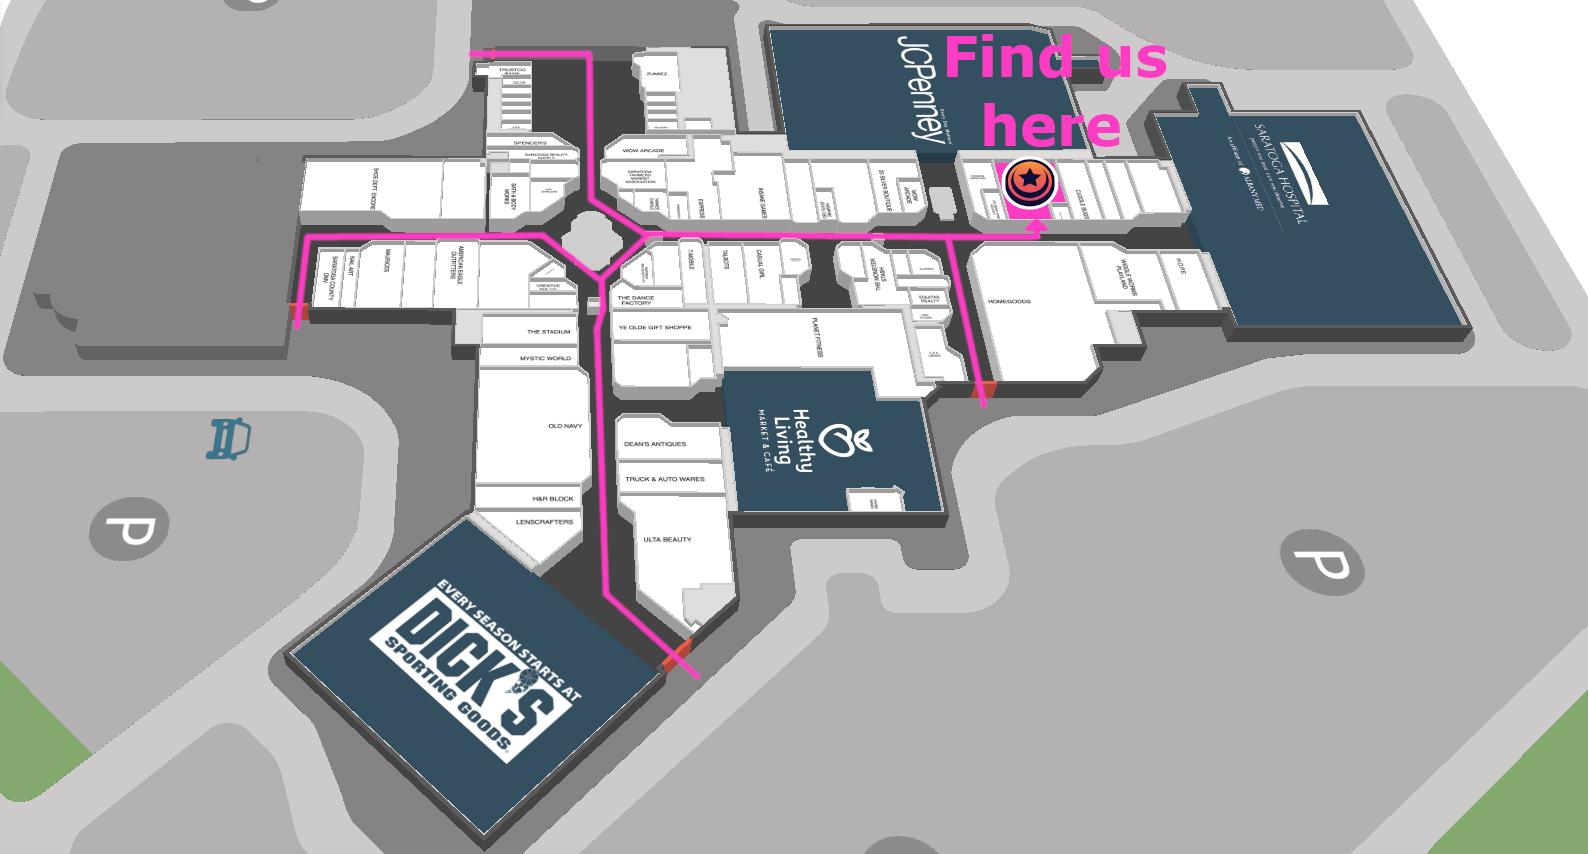 mall map far